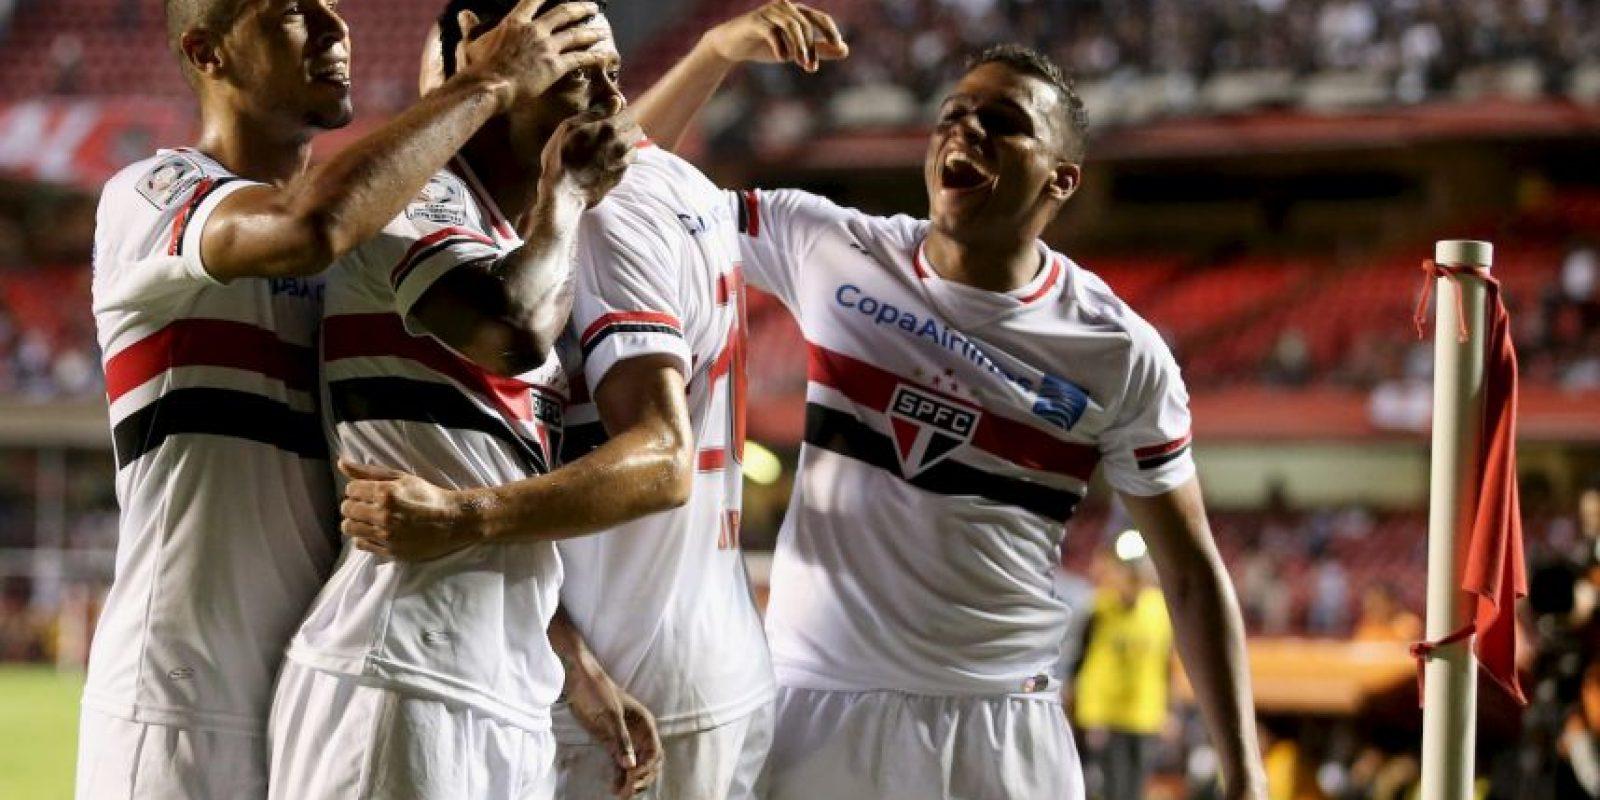 Sao Paulo 2-0 Corinthians Foto:Getty Images